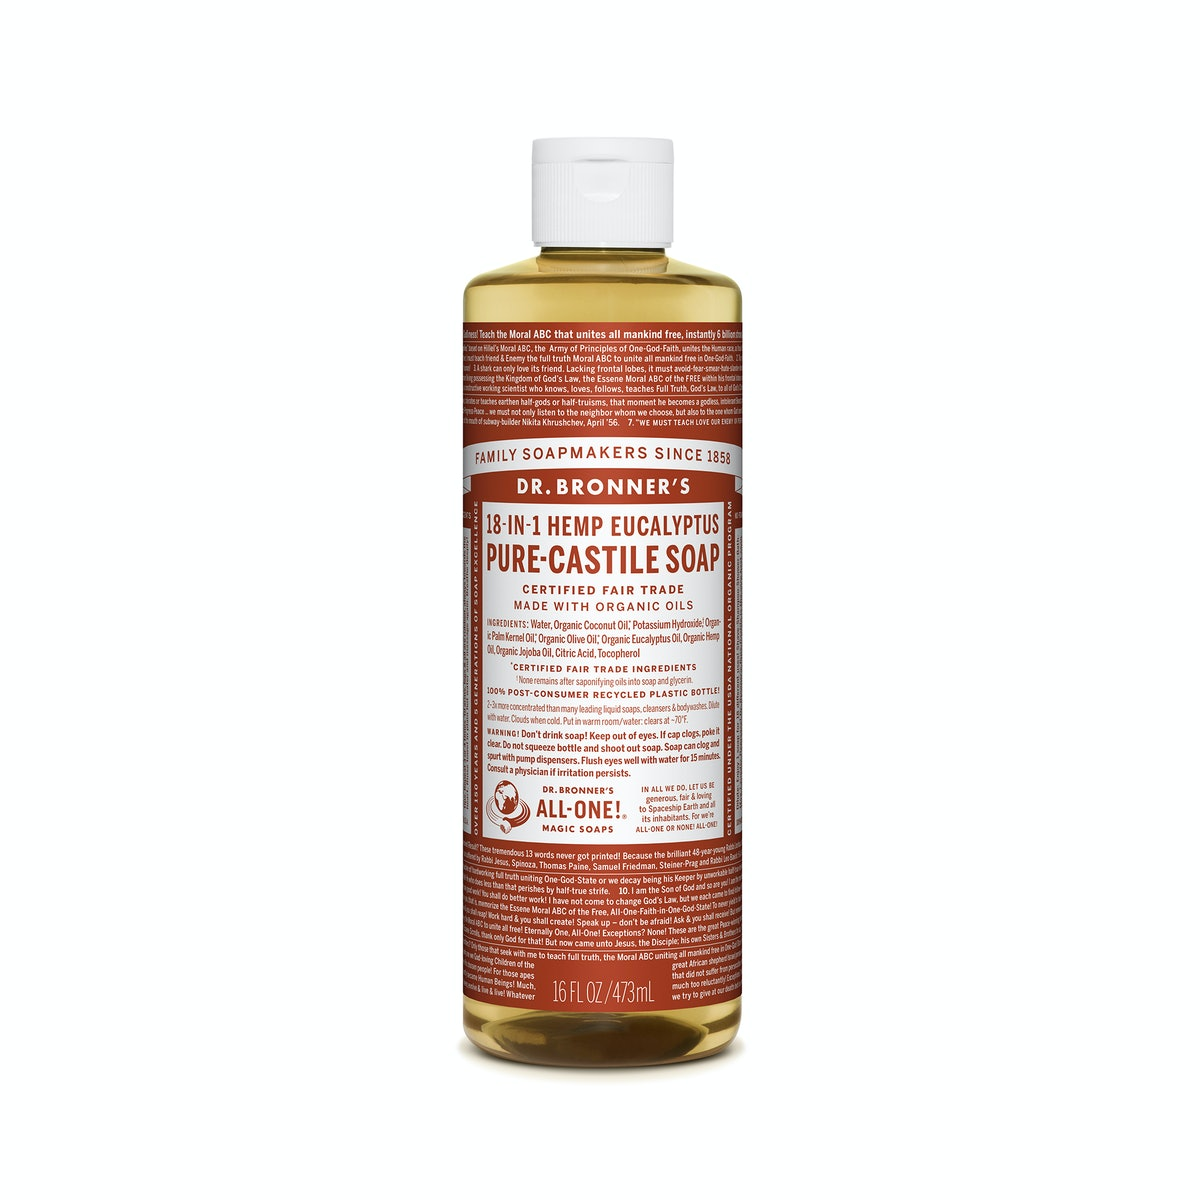 Dr. Bronner's Eucalyptus Pure Castille Liquid Soap